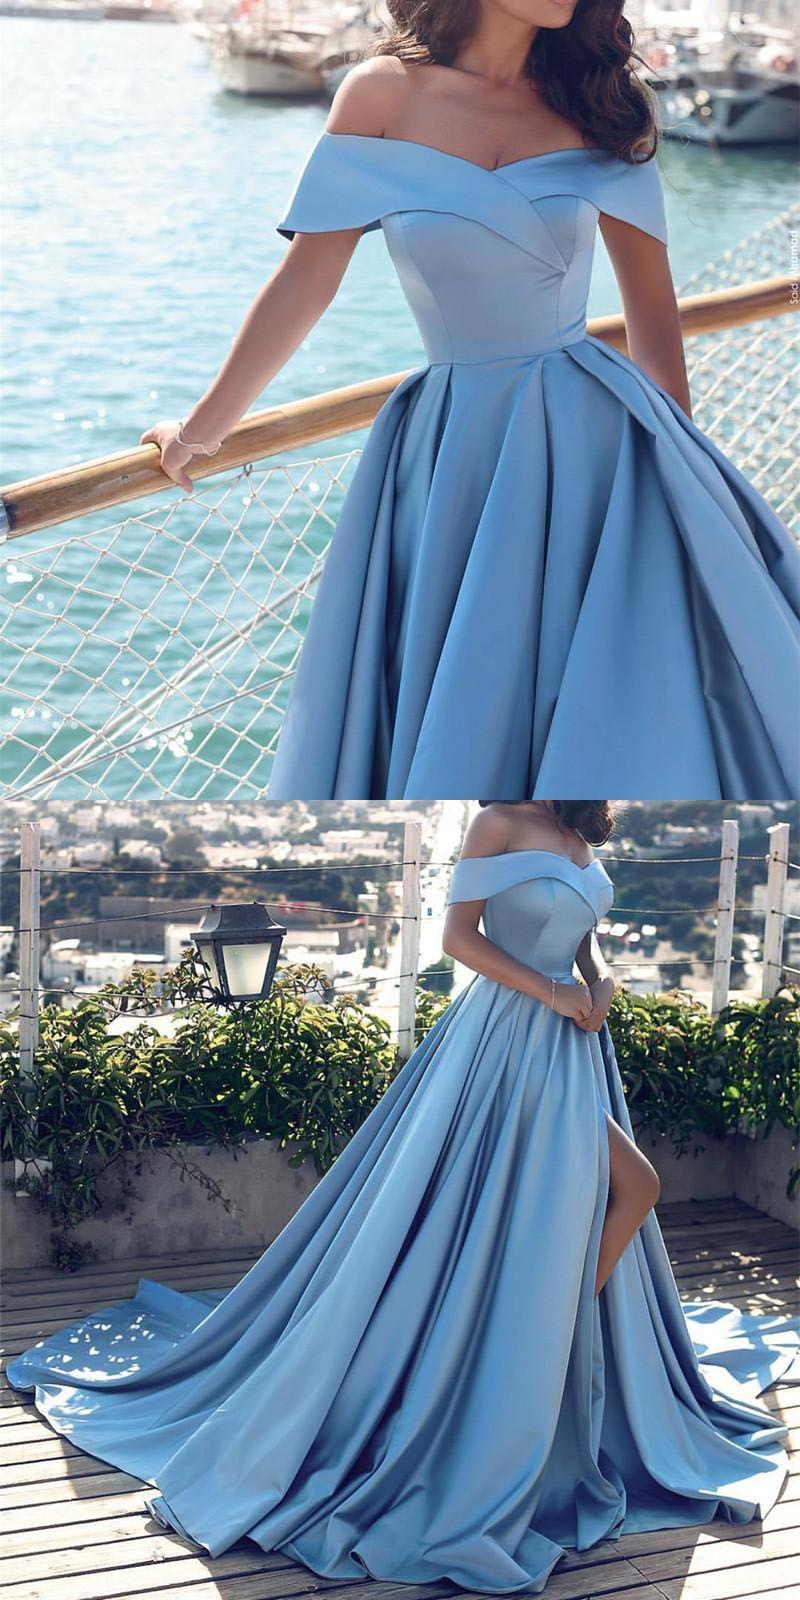 Blue prom dressesofftheshoulder prom dressball gown prom dresses